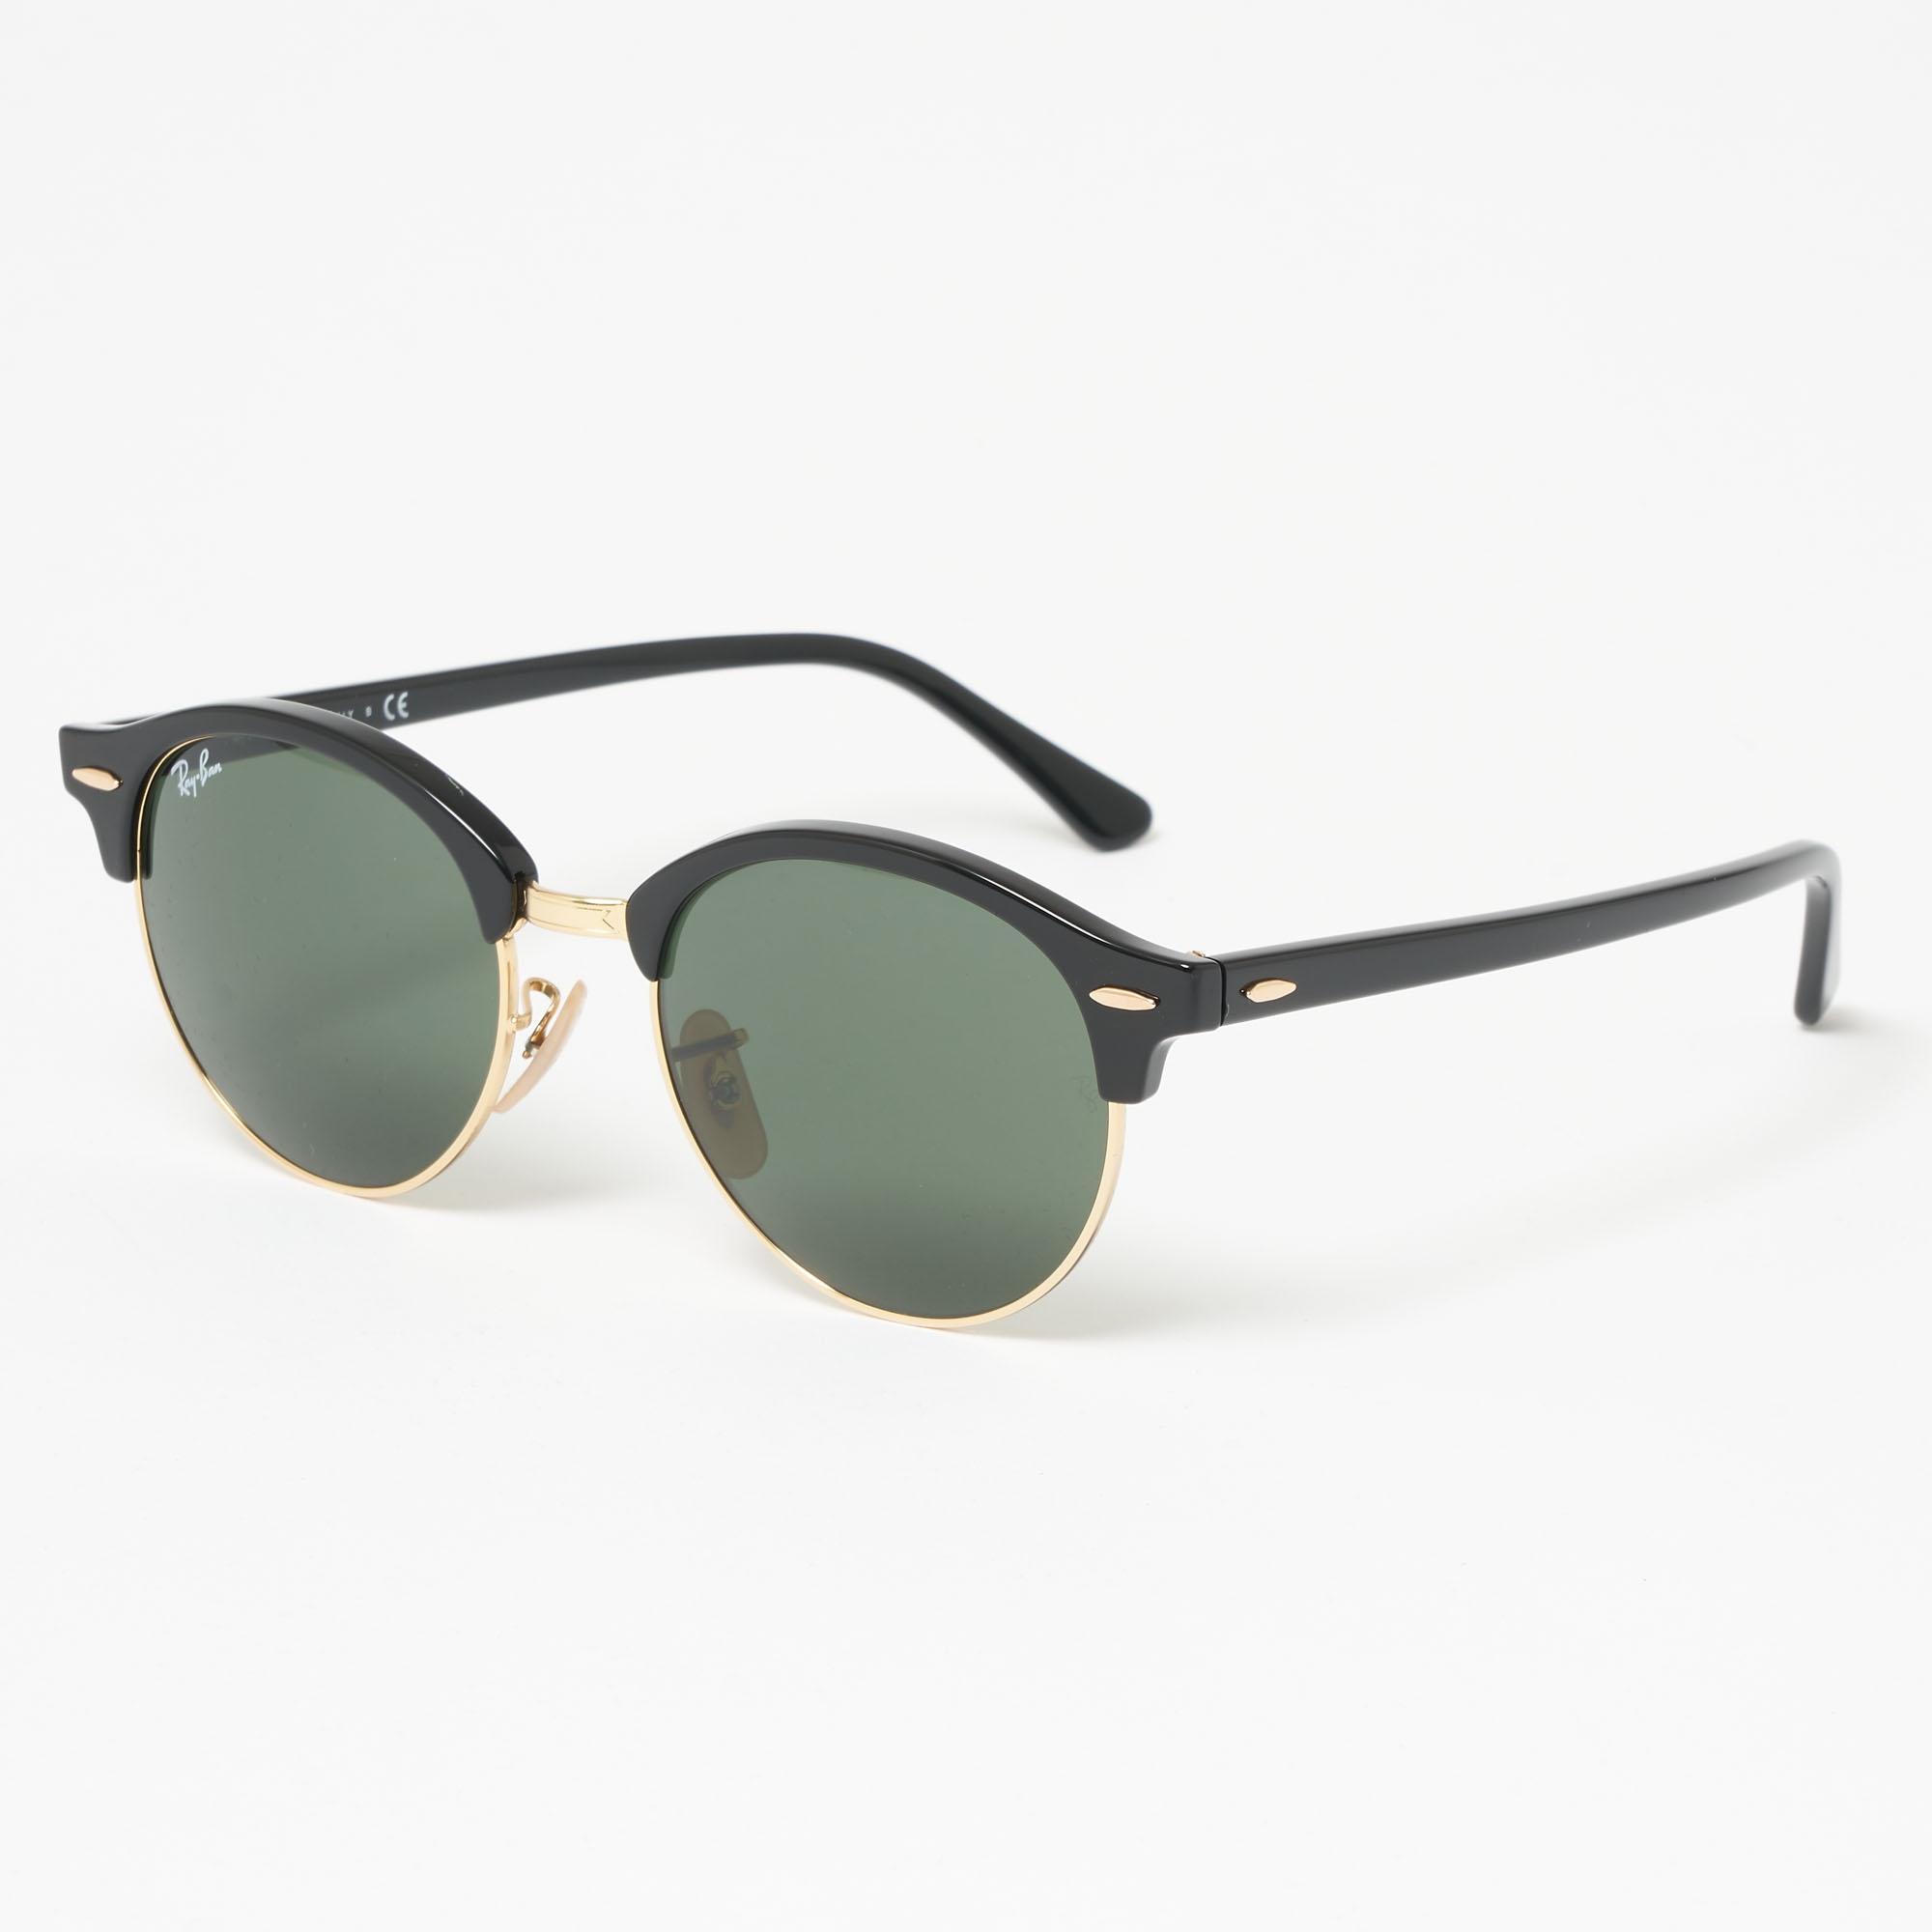 59f26bdf98 Ray-Ban Black Classic Clubmaster Sunglasses - Classic G15 Lenses in ...